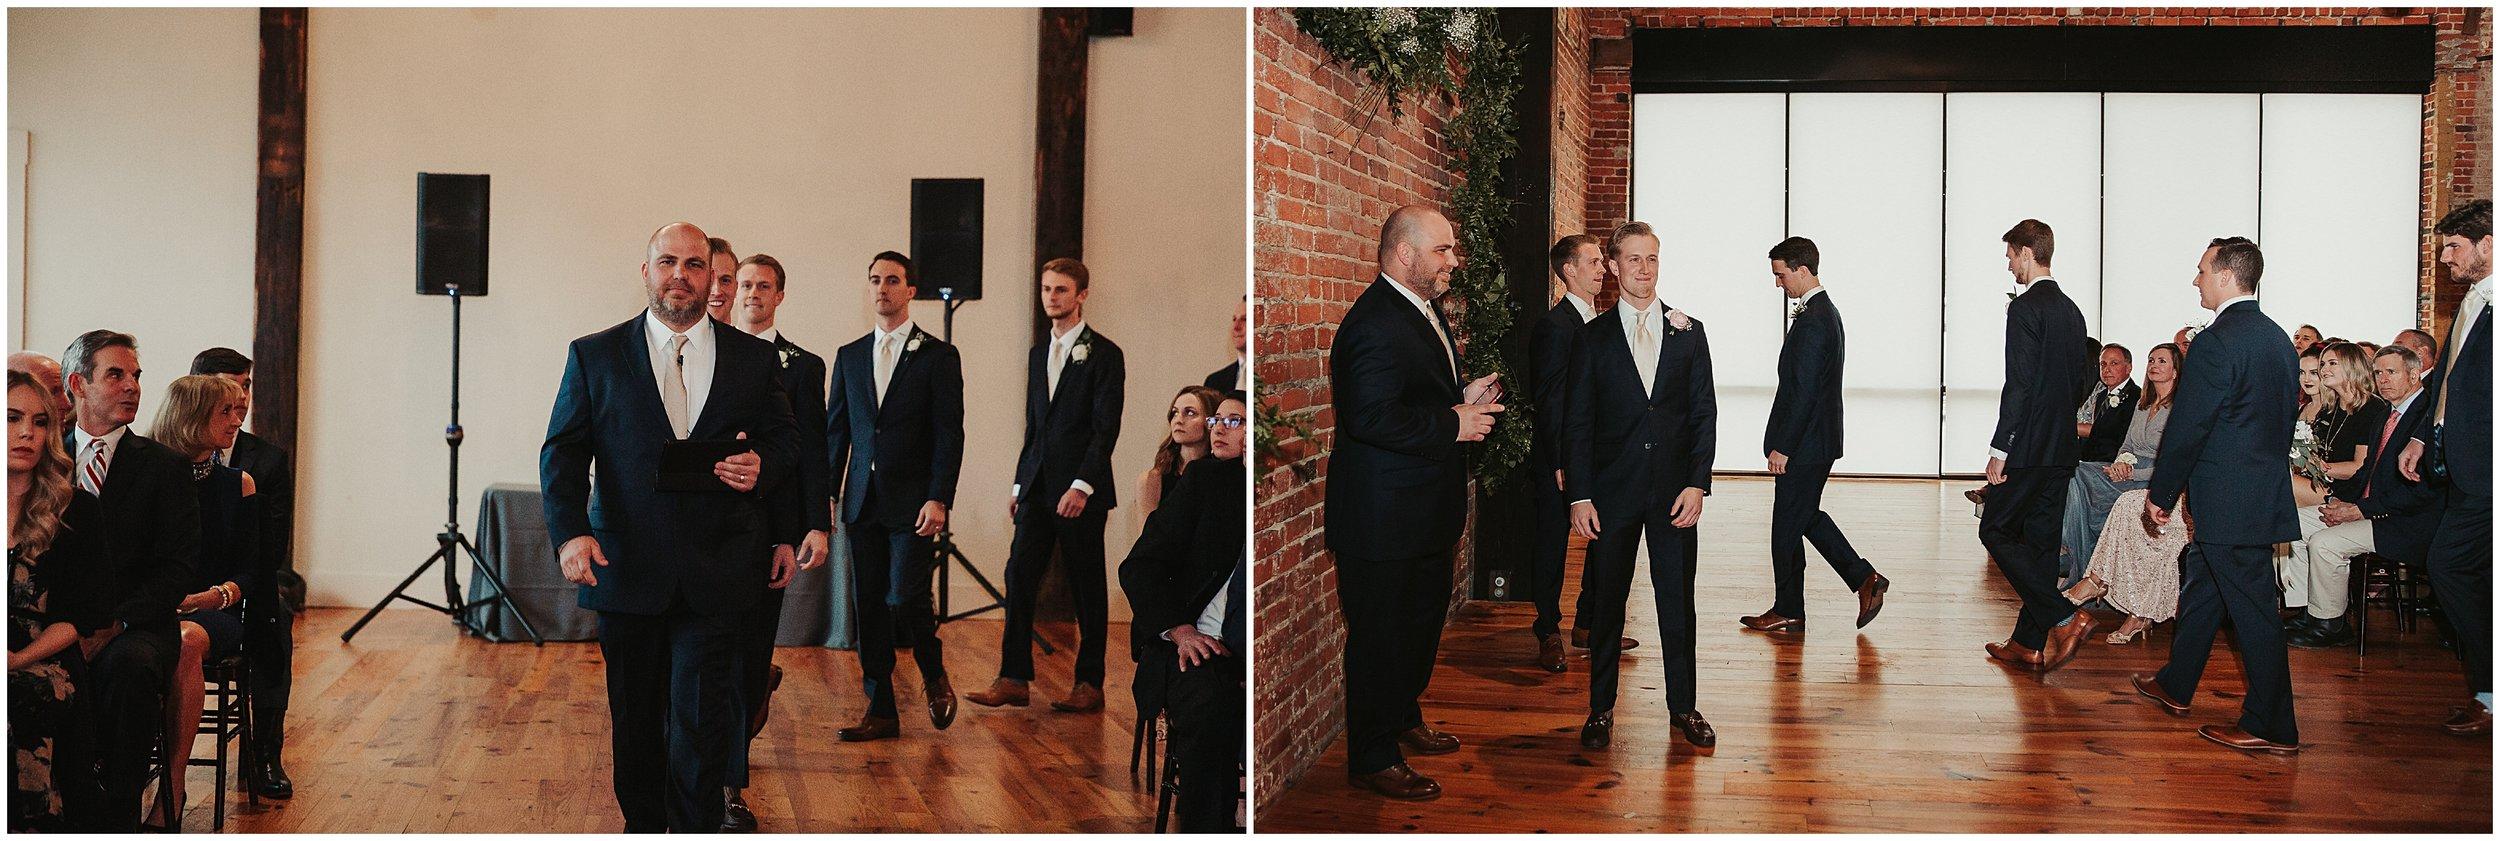 Charlotte NC wedding photographer_0660.jpg